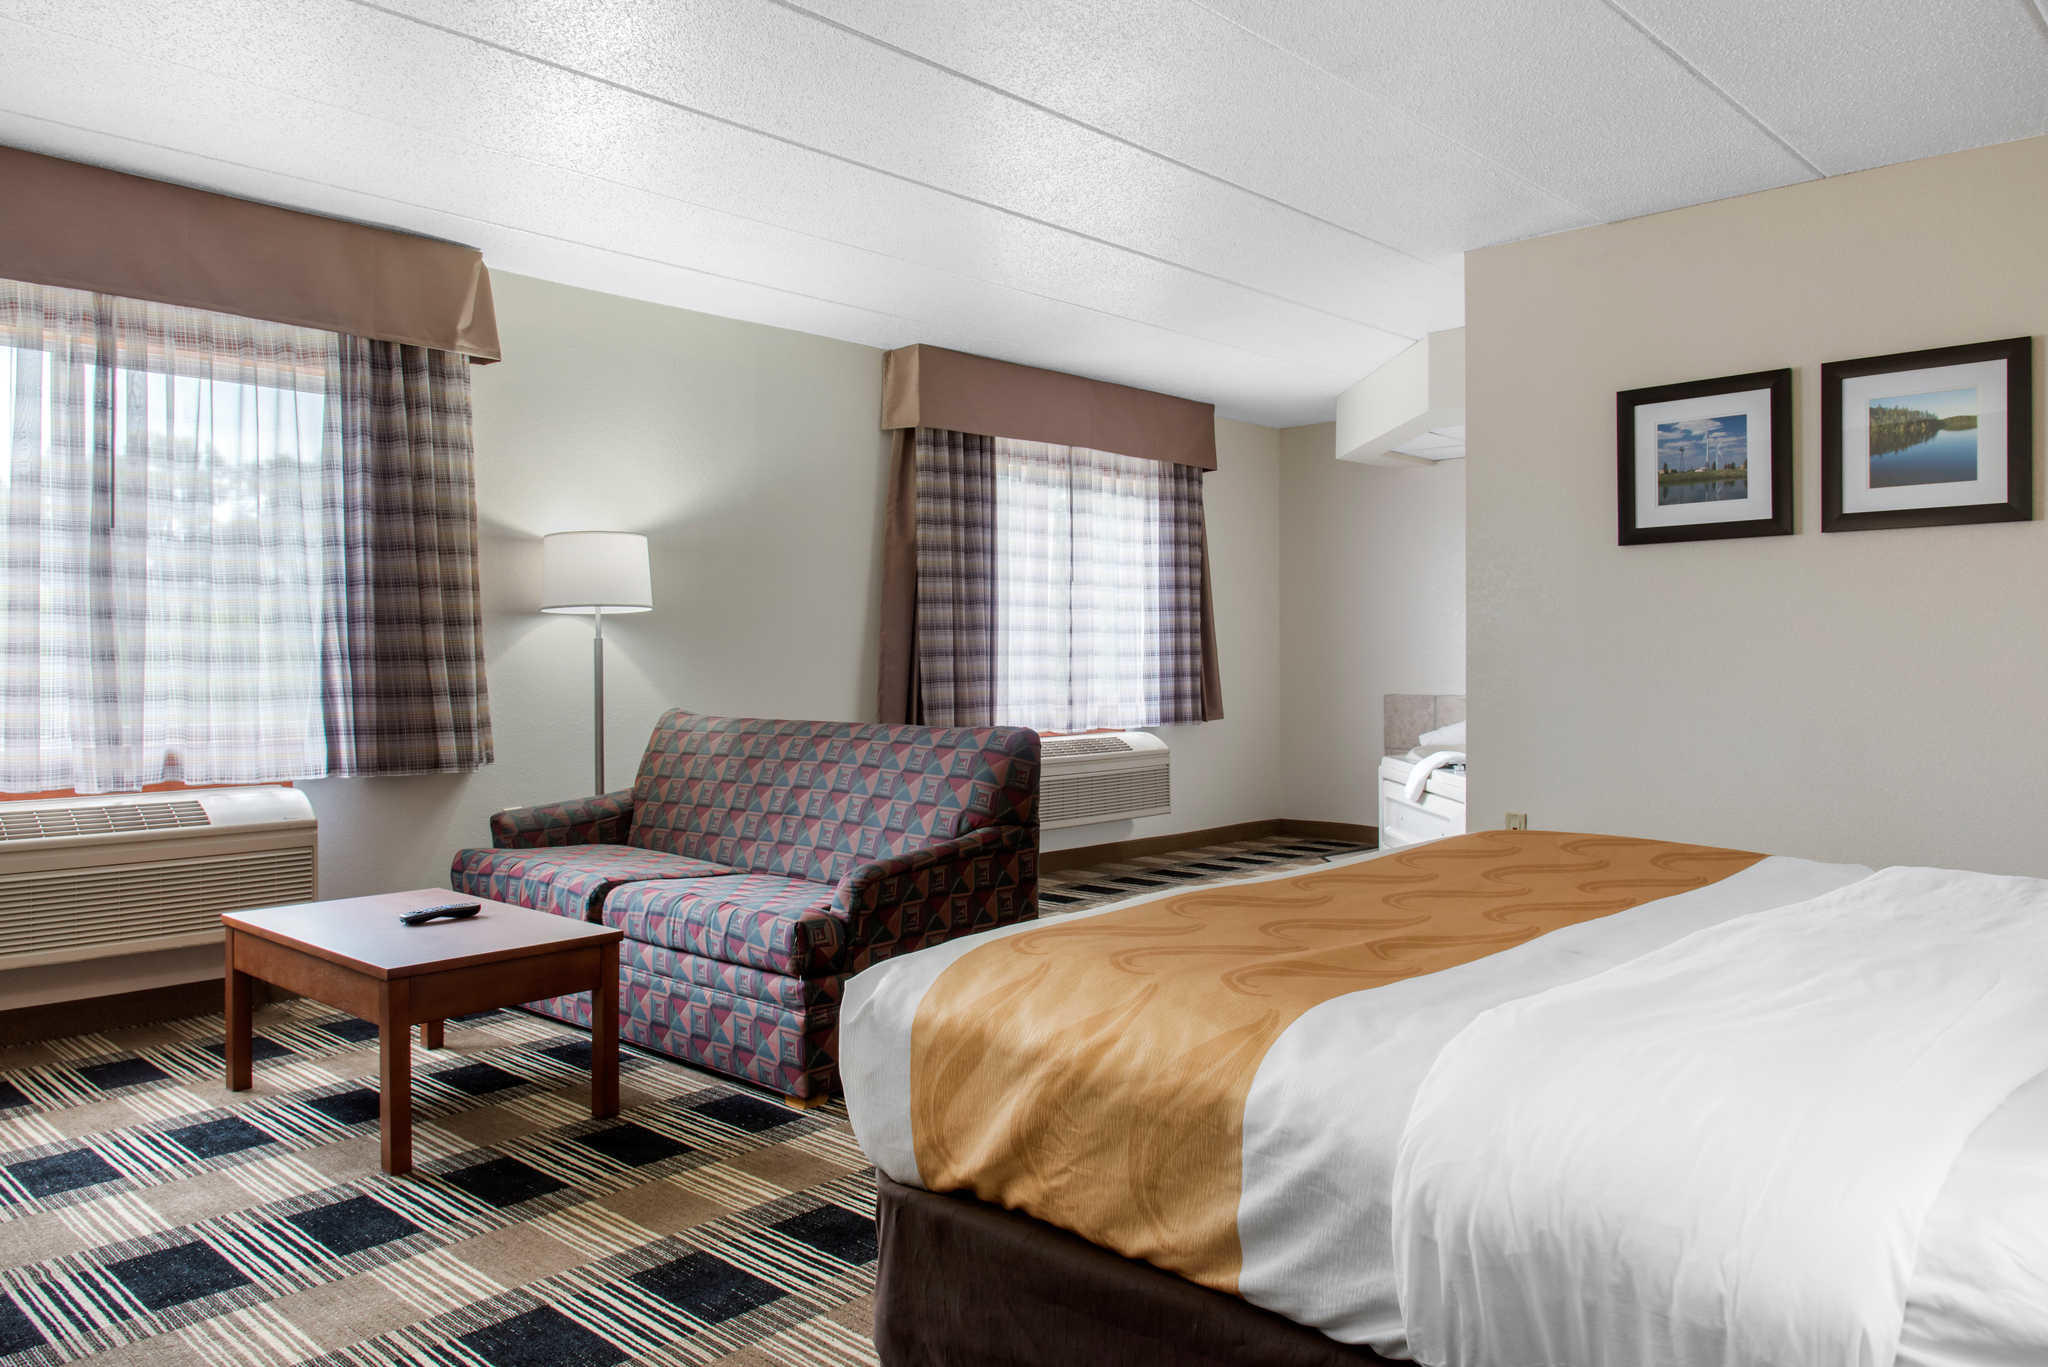 Quality Inn image 42